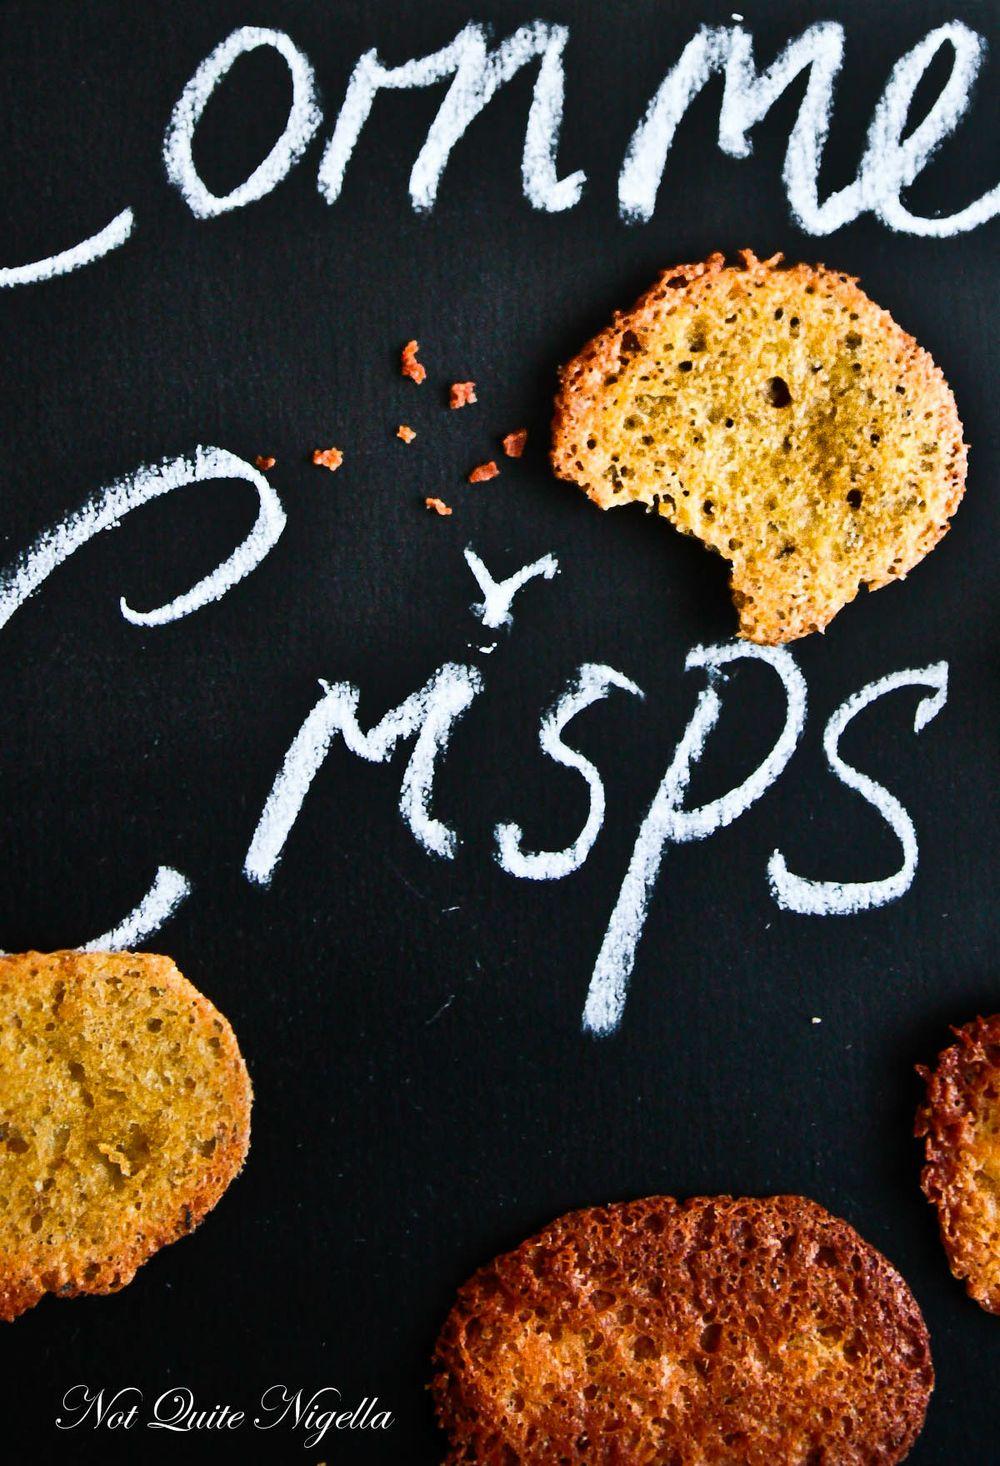 cornmeal-crisps-1-2